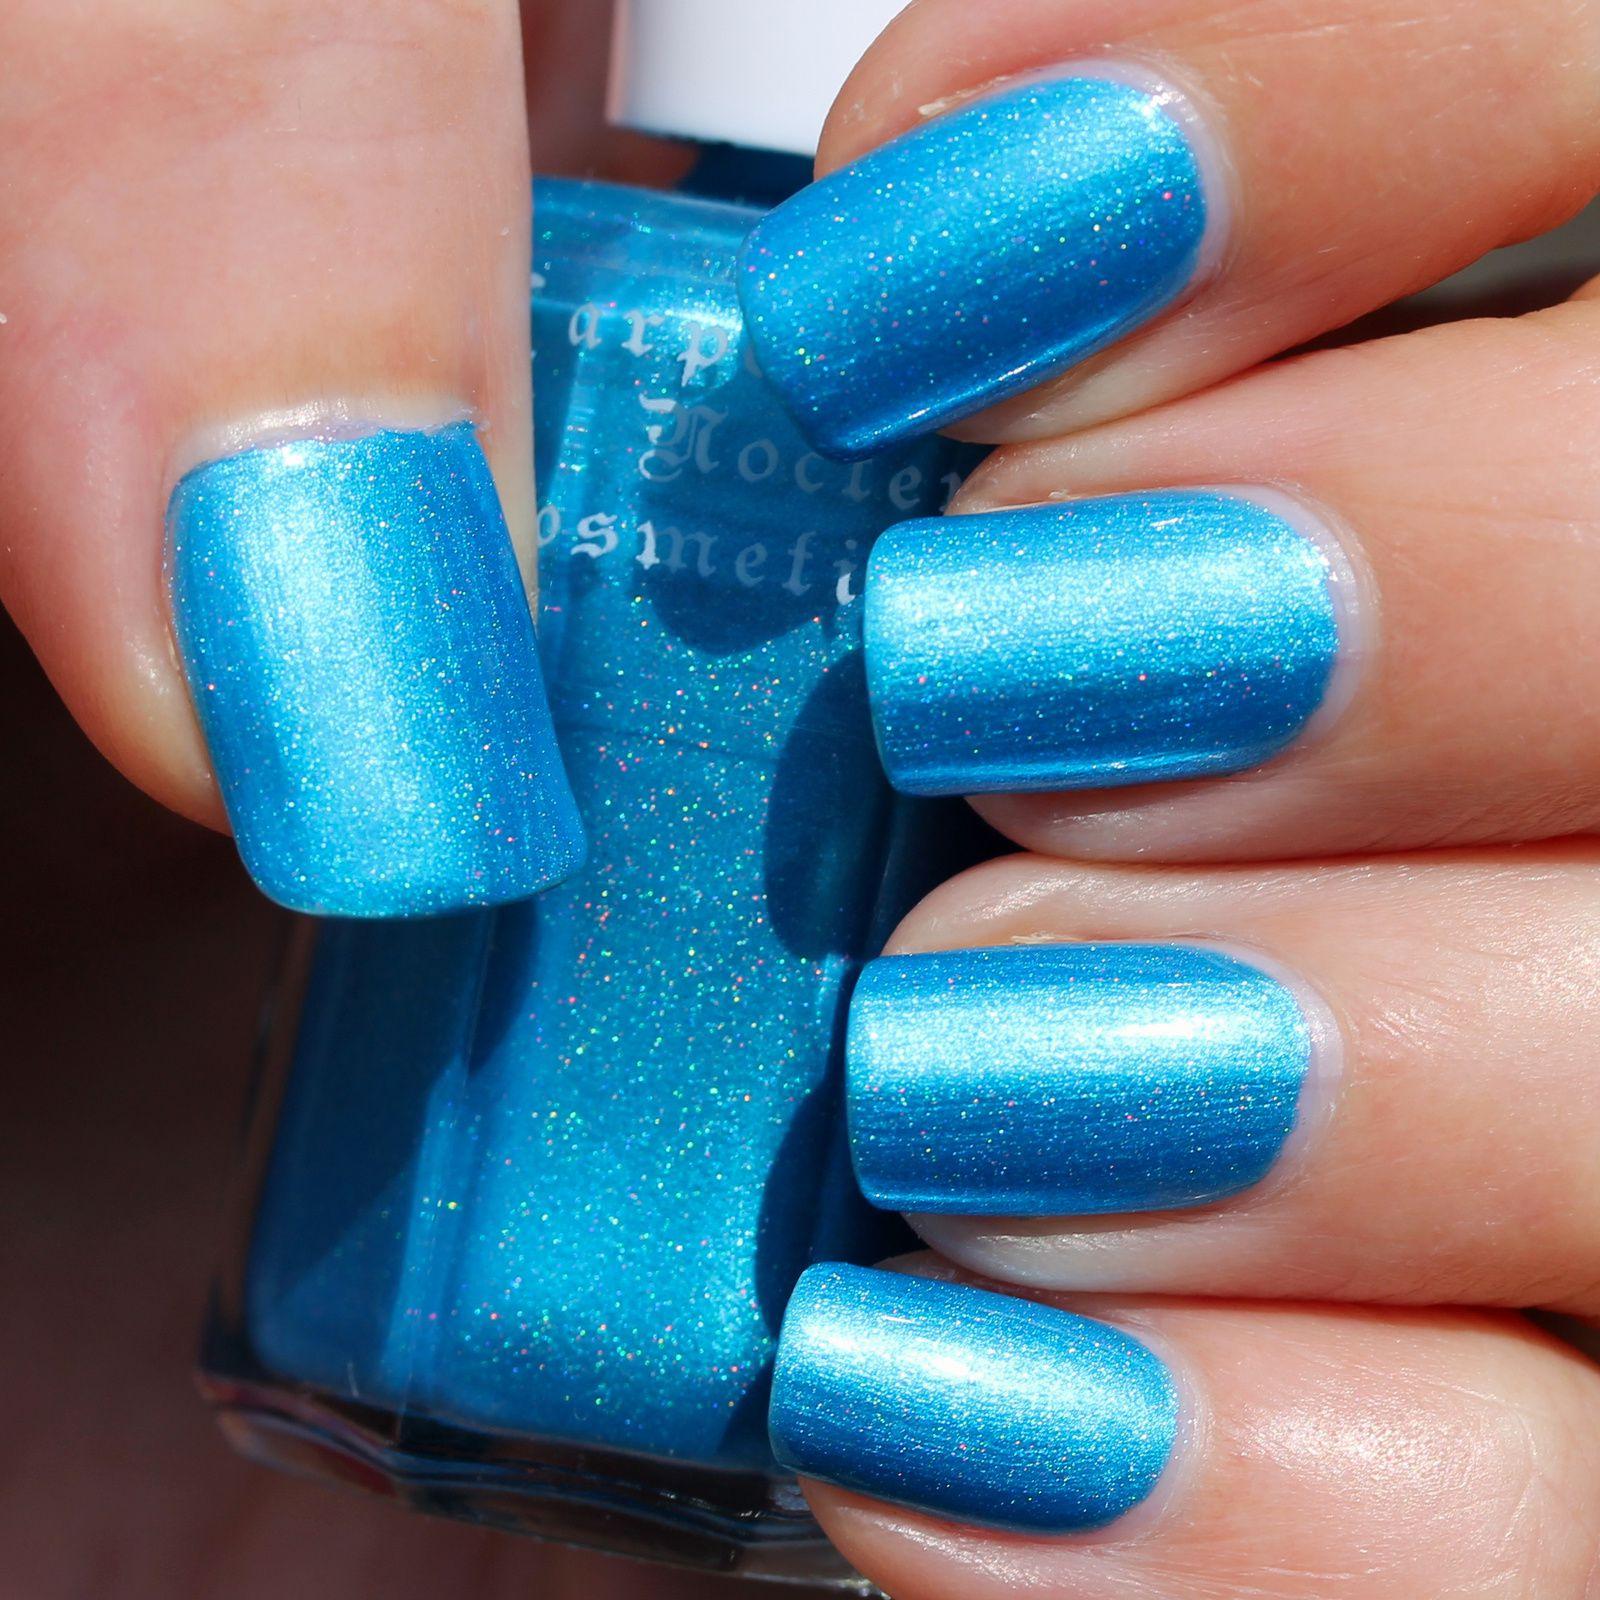 Duri Rejuvacote / Carpe Noctem Cosmetics King Triton /  Sally Hansen Miracle Gel Top Coat